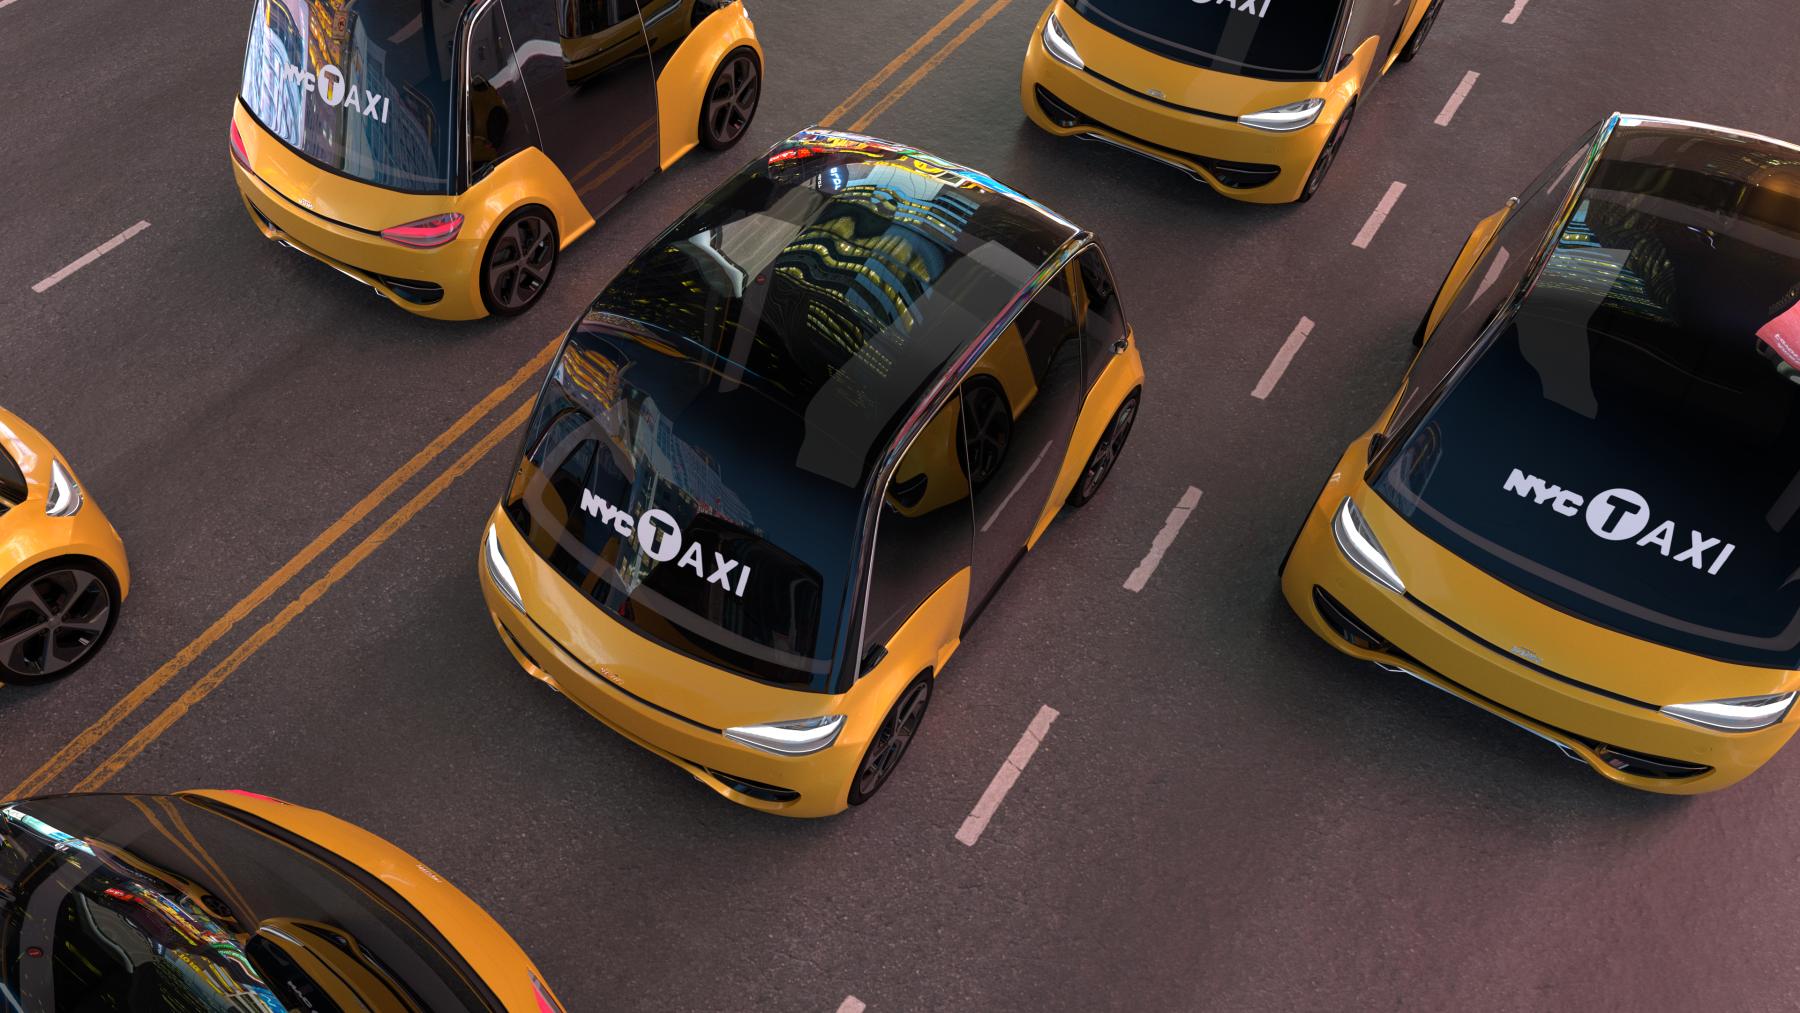 Timmys Taxi XL-1-1800x1013